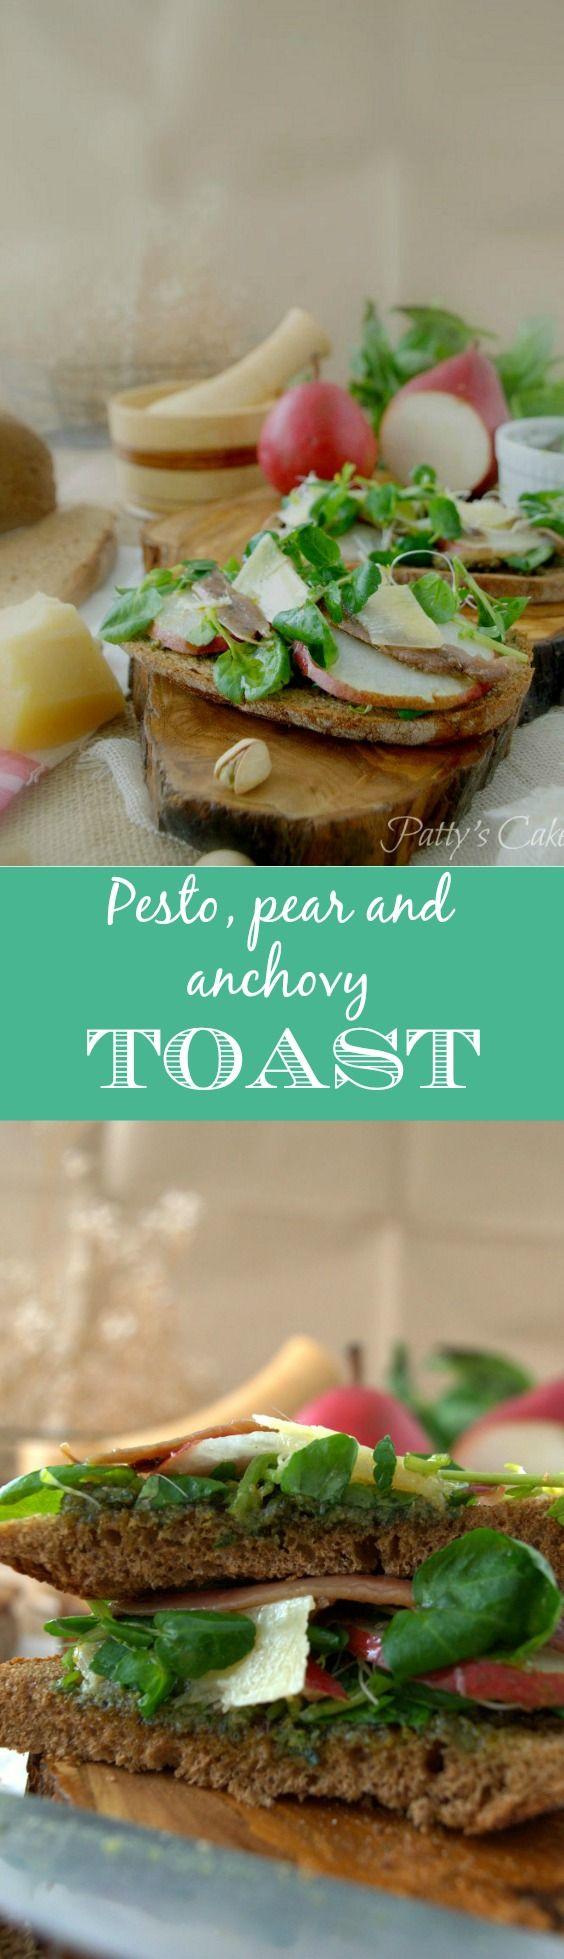 Pesto, pear and anchovy toast - A classy appetizer - English recipe included - Tosta de pesto, pera y anchoa